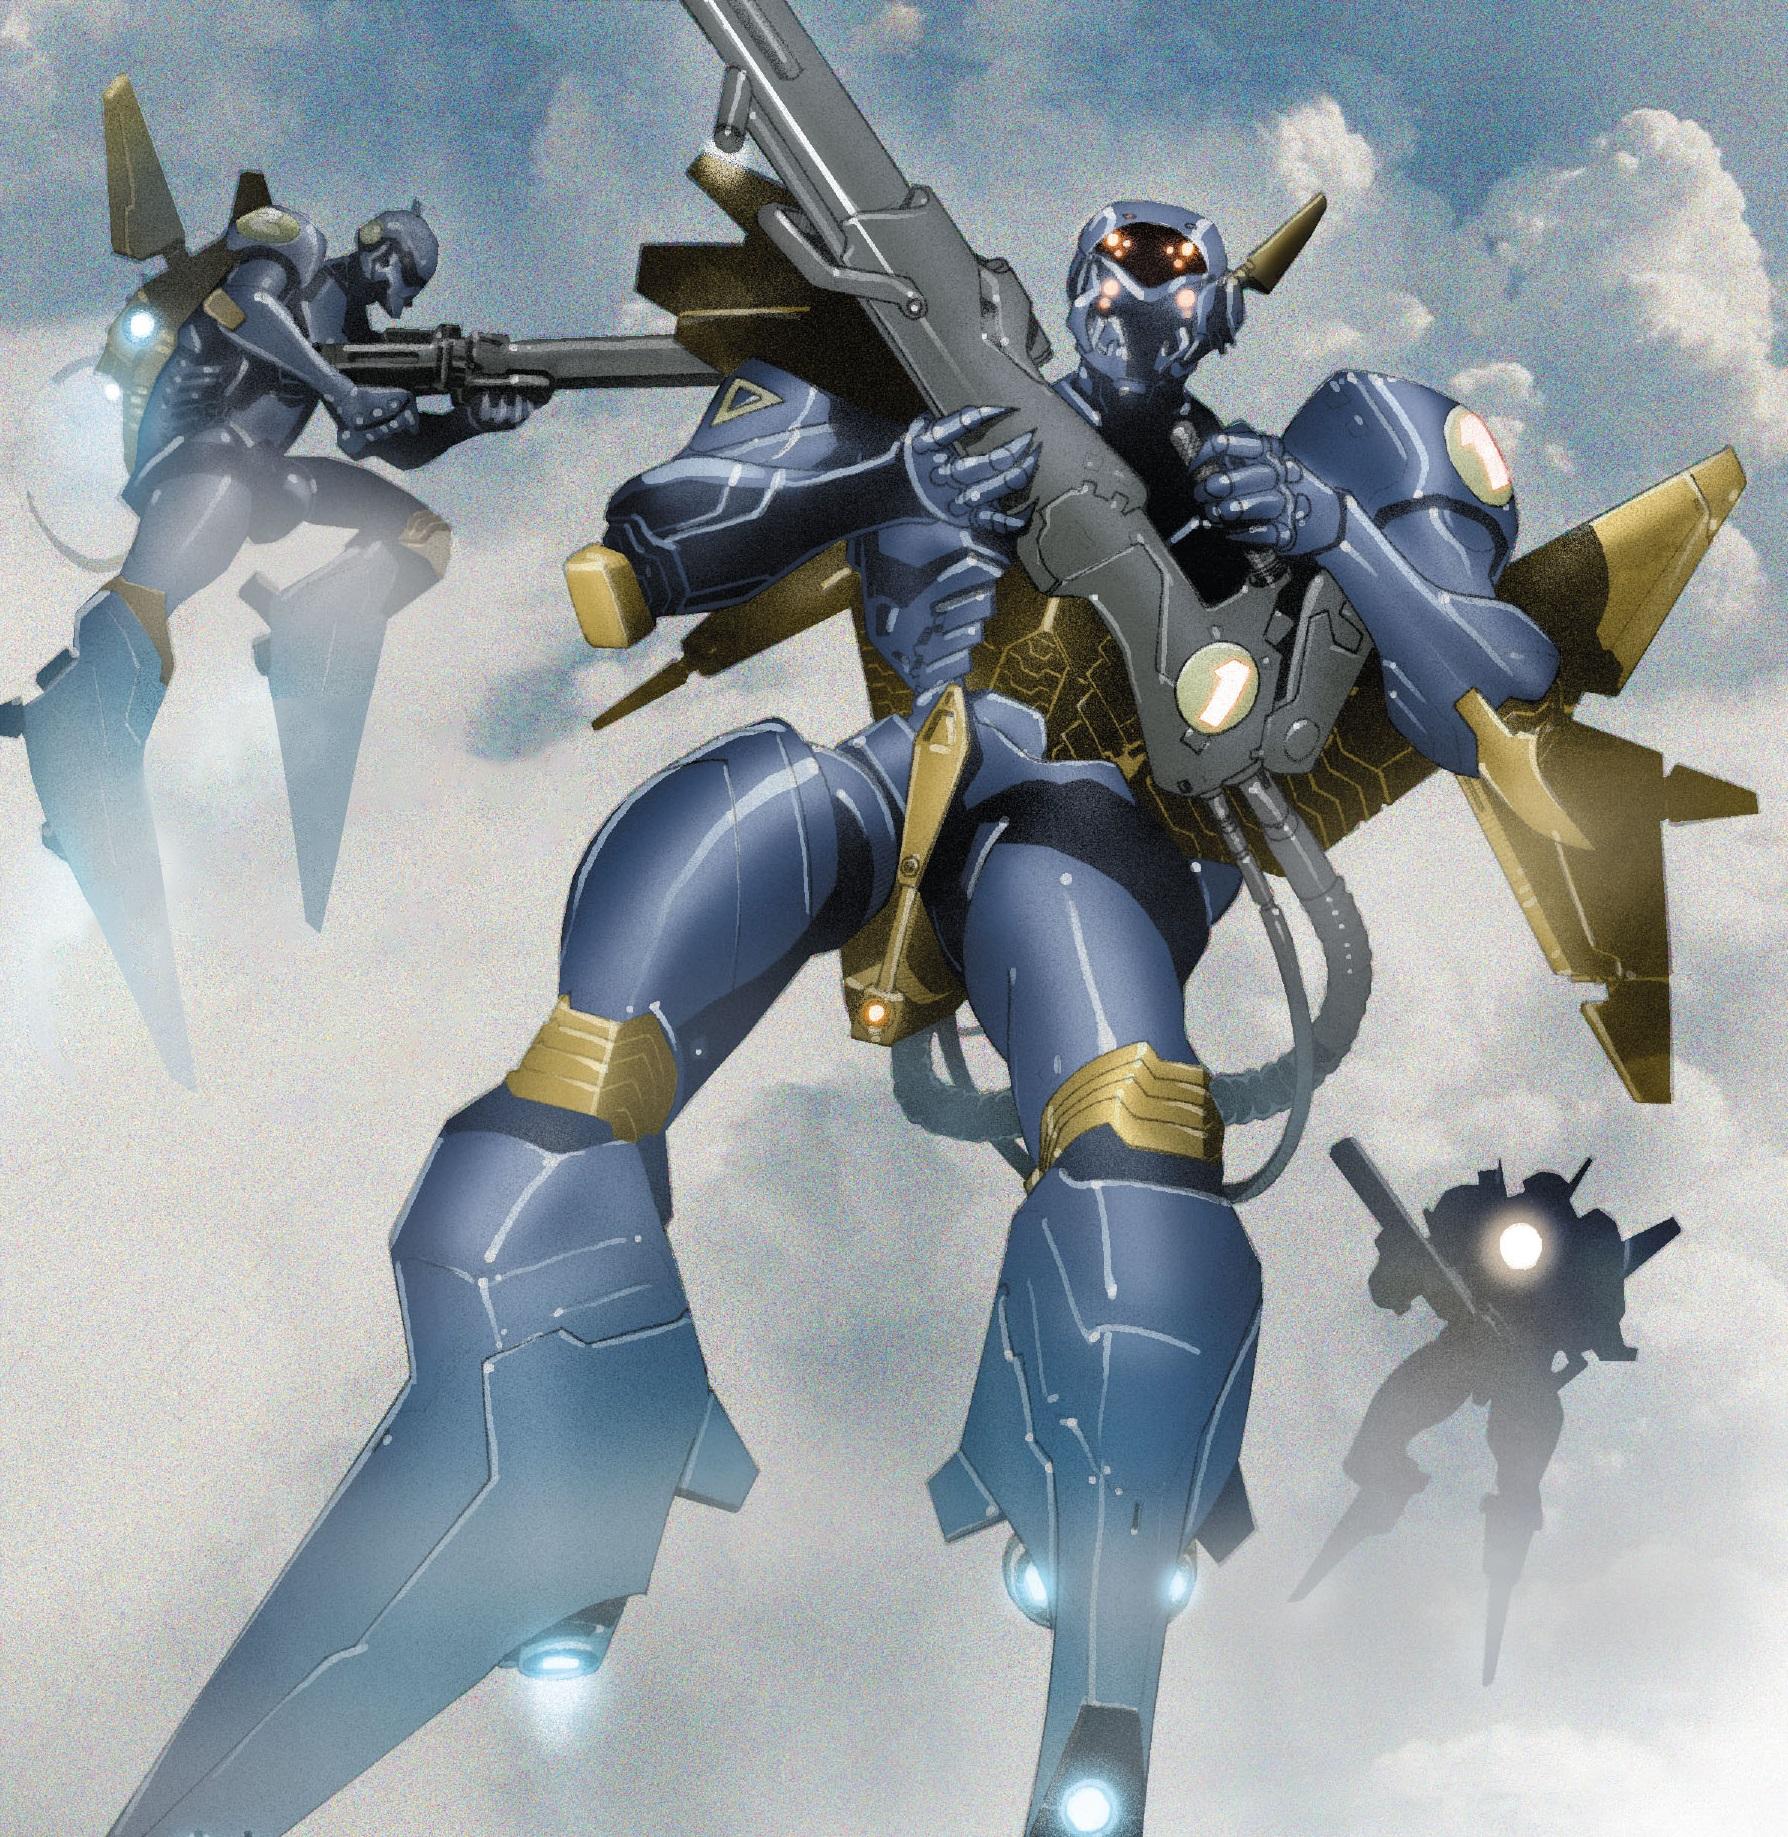 Raiders (China) (Earth-616)/Gallery